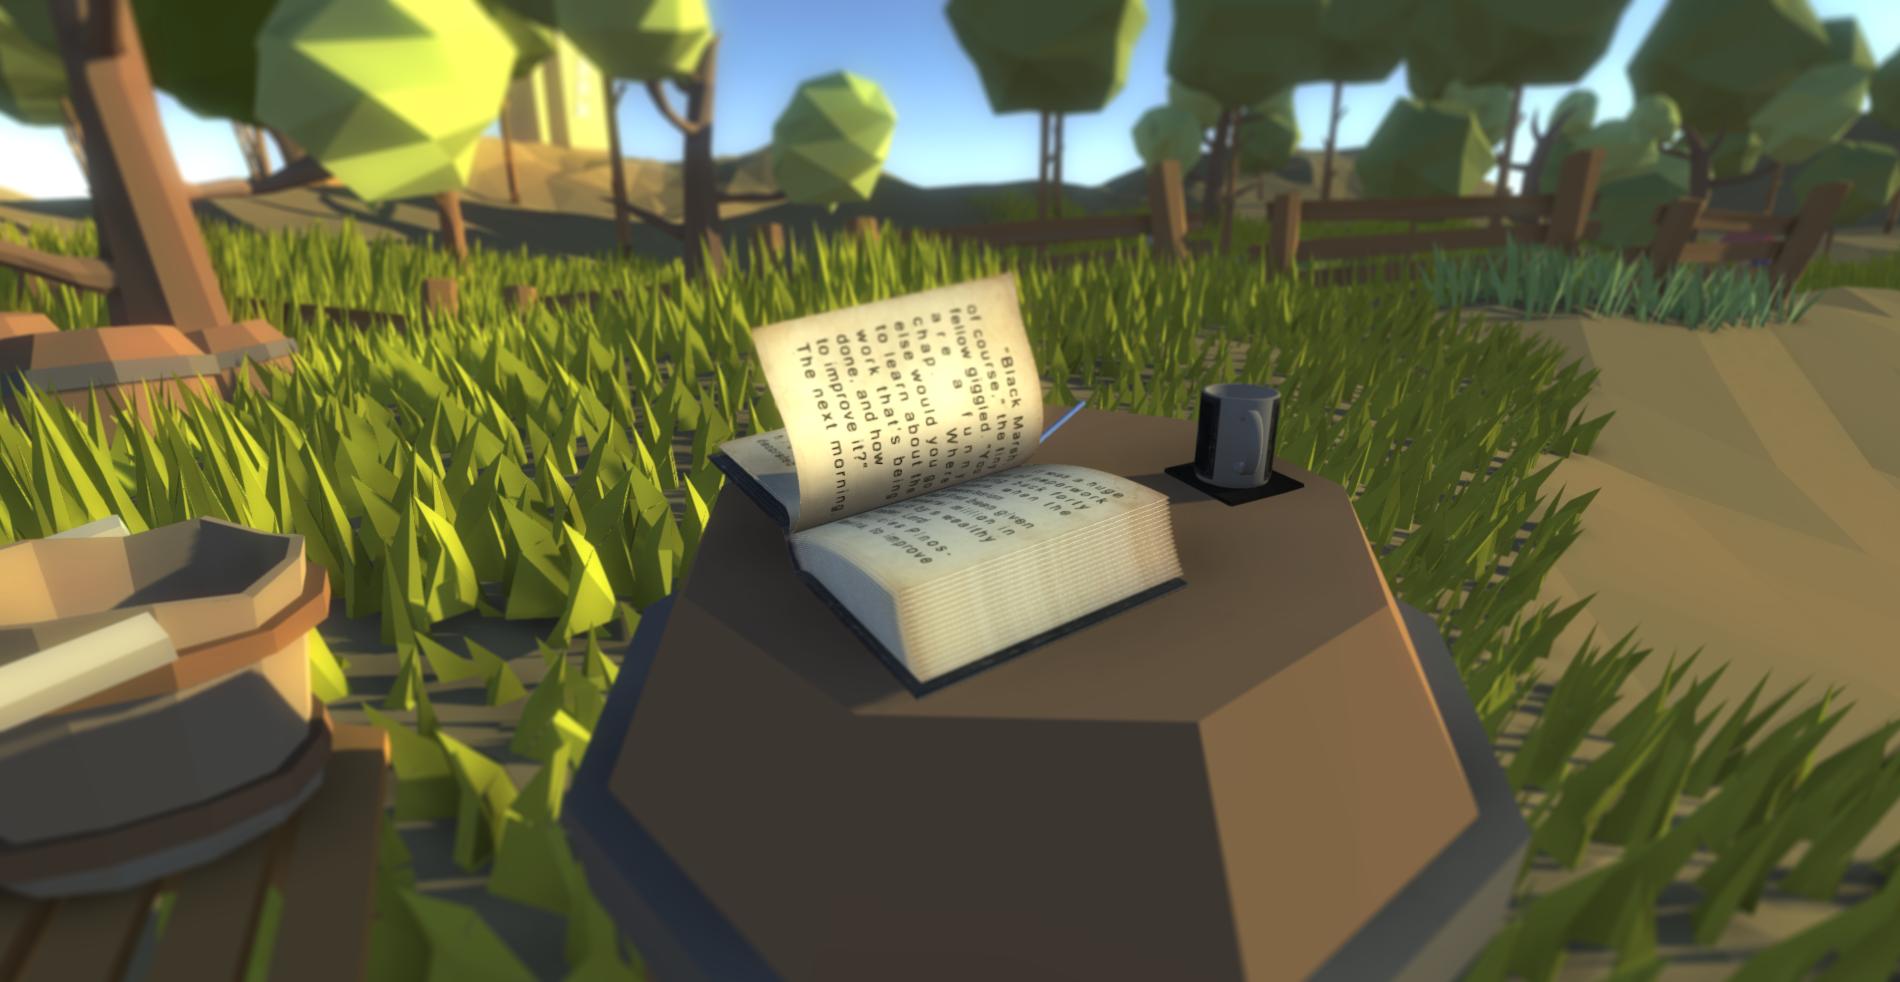 Book viewer